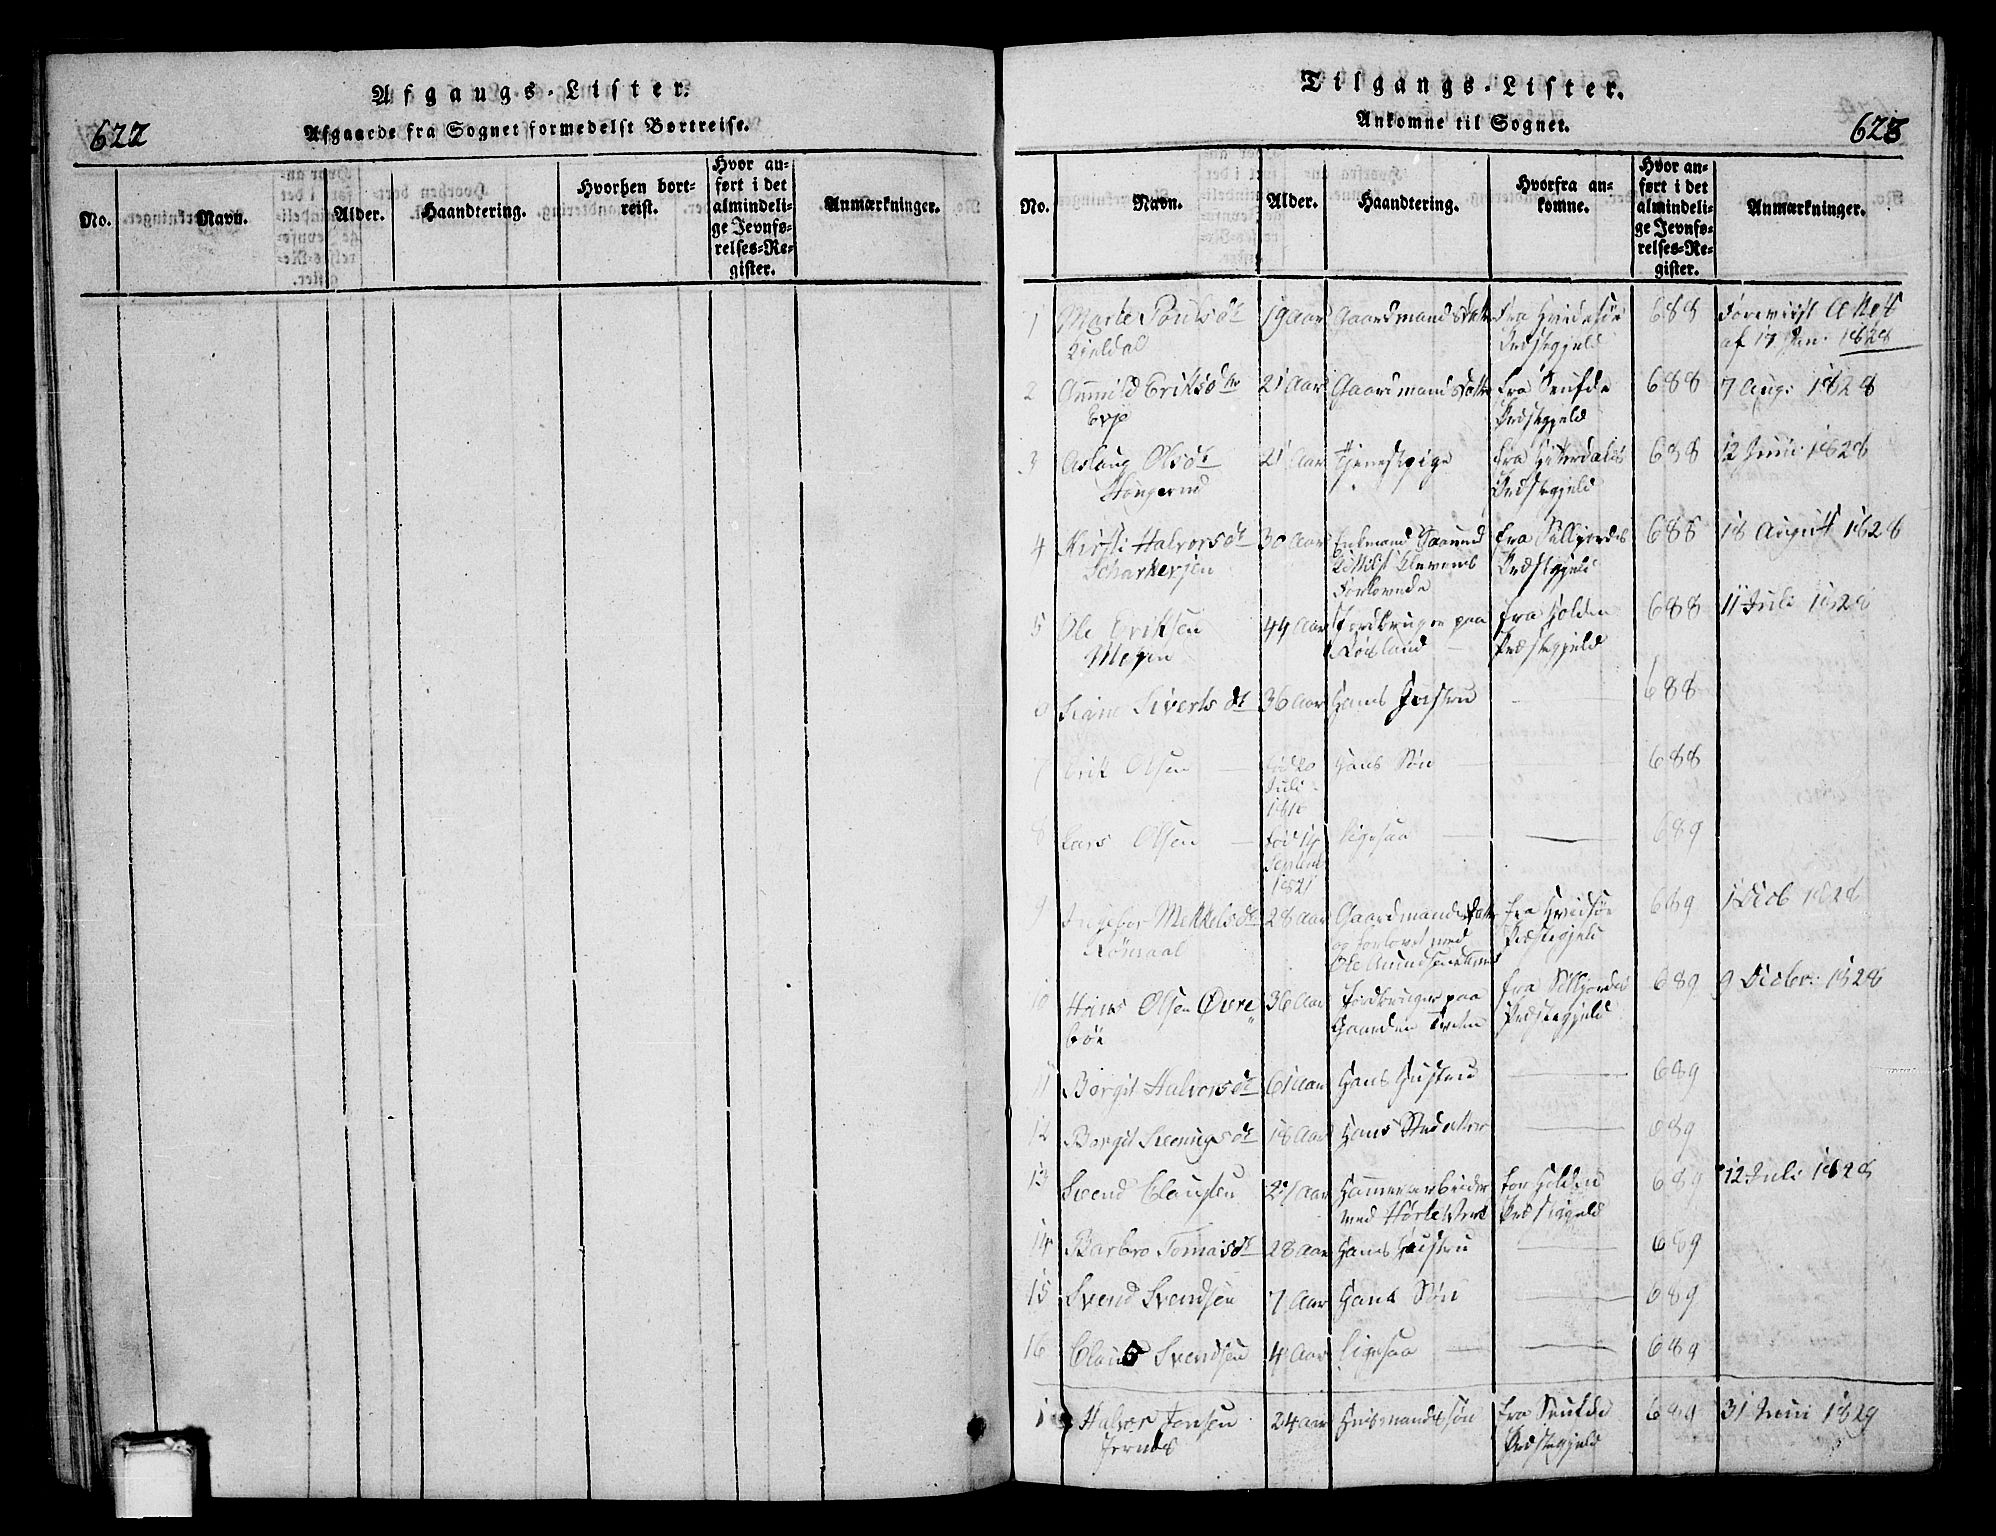 SAKO, Bø kirkebøker, G/Ga/L0001: Klokkerbok nr. 1, 1815-1831, s. 622-623